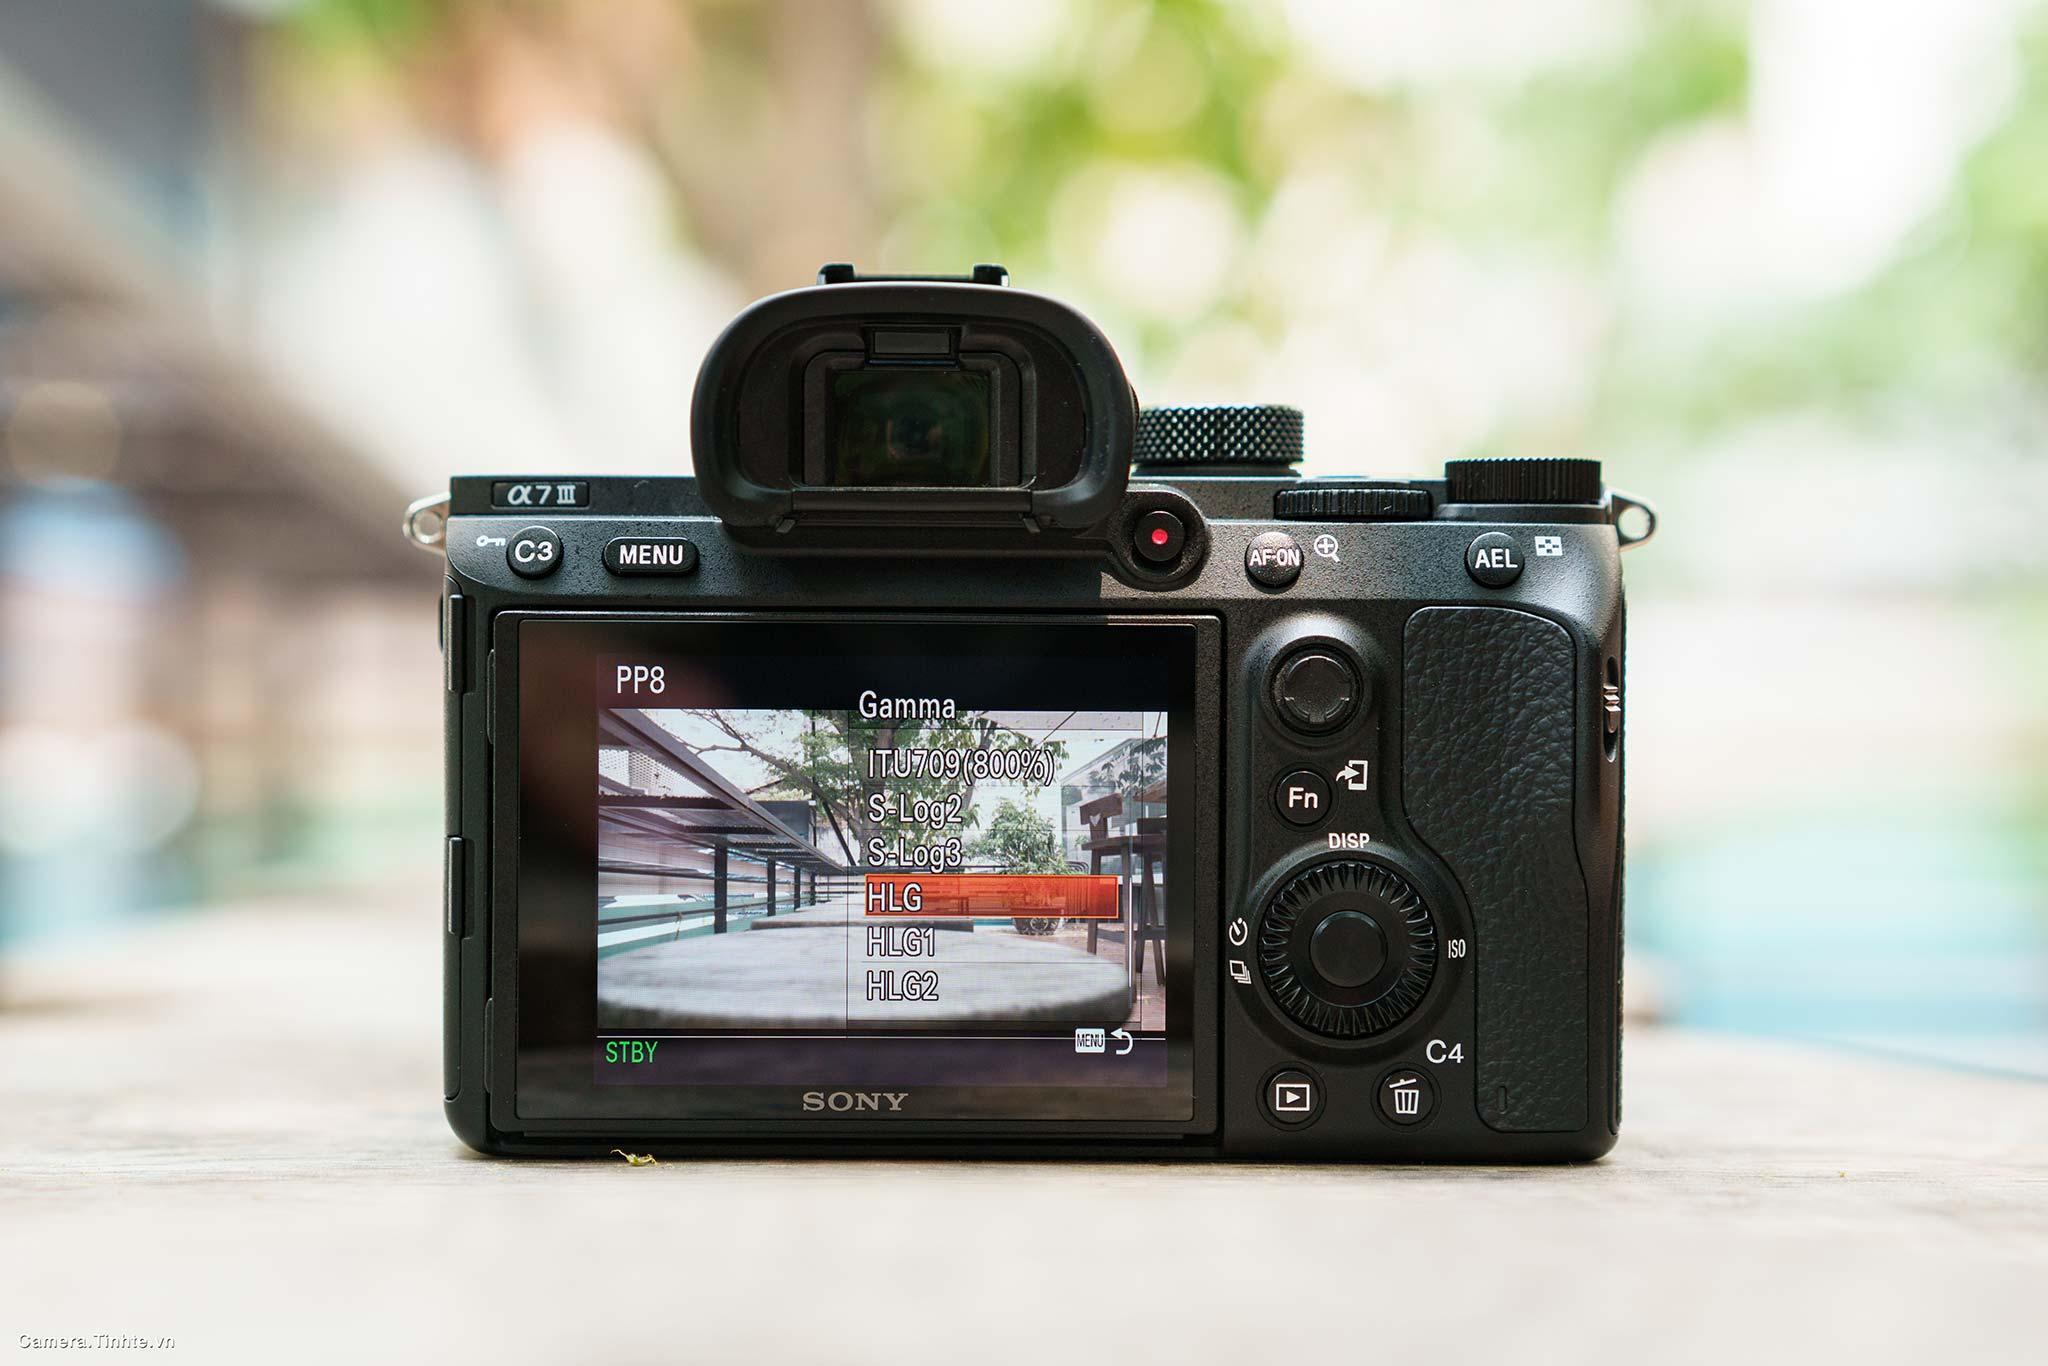 Camera.Tinhte.vn_Sony-A7-III_DSC06244.jpg